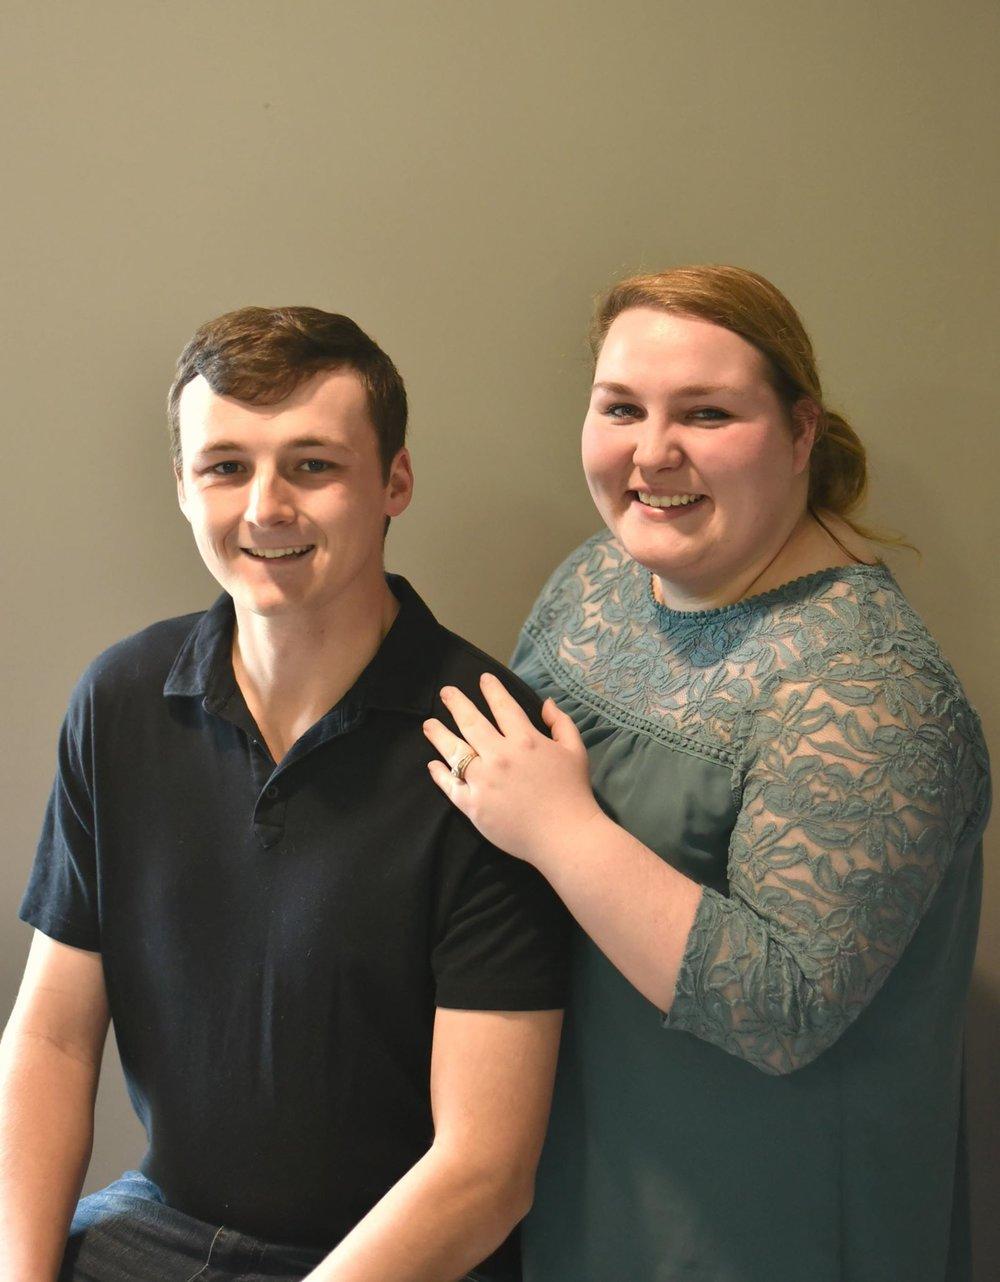 Mason & Leah Geiger - OC Kids Leaders